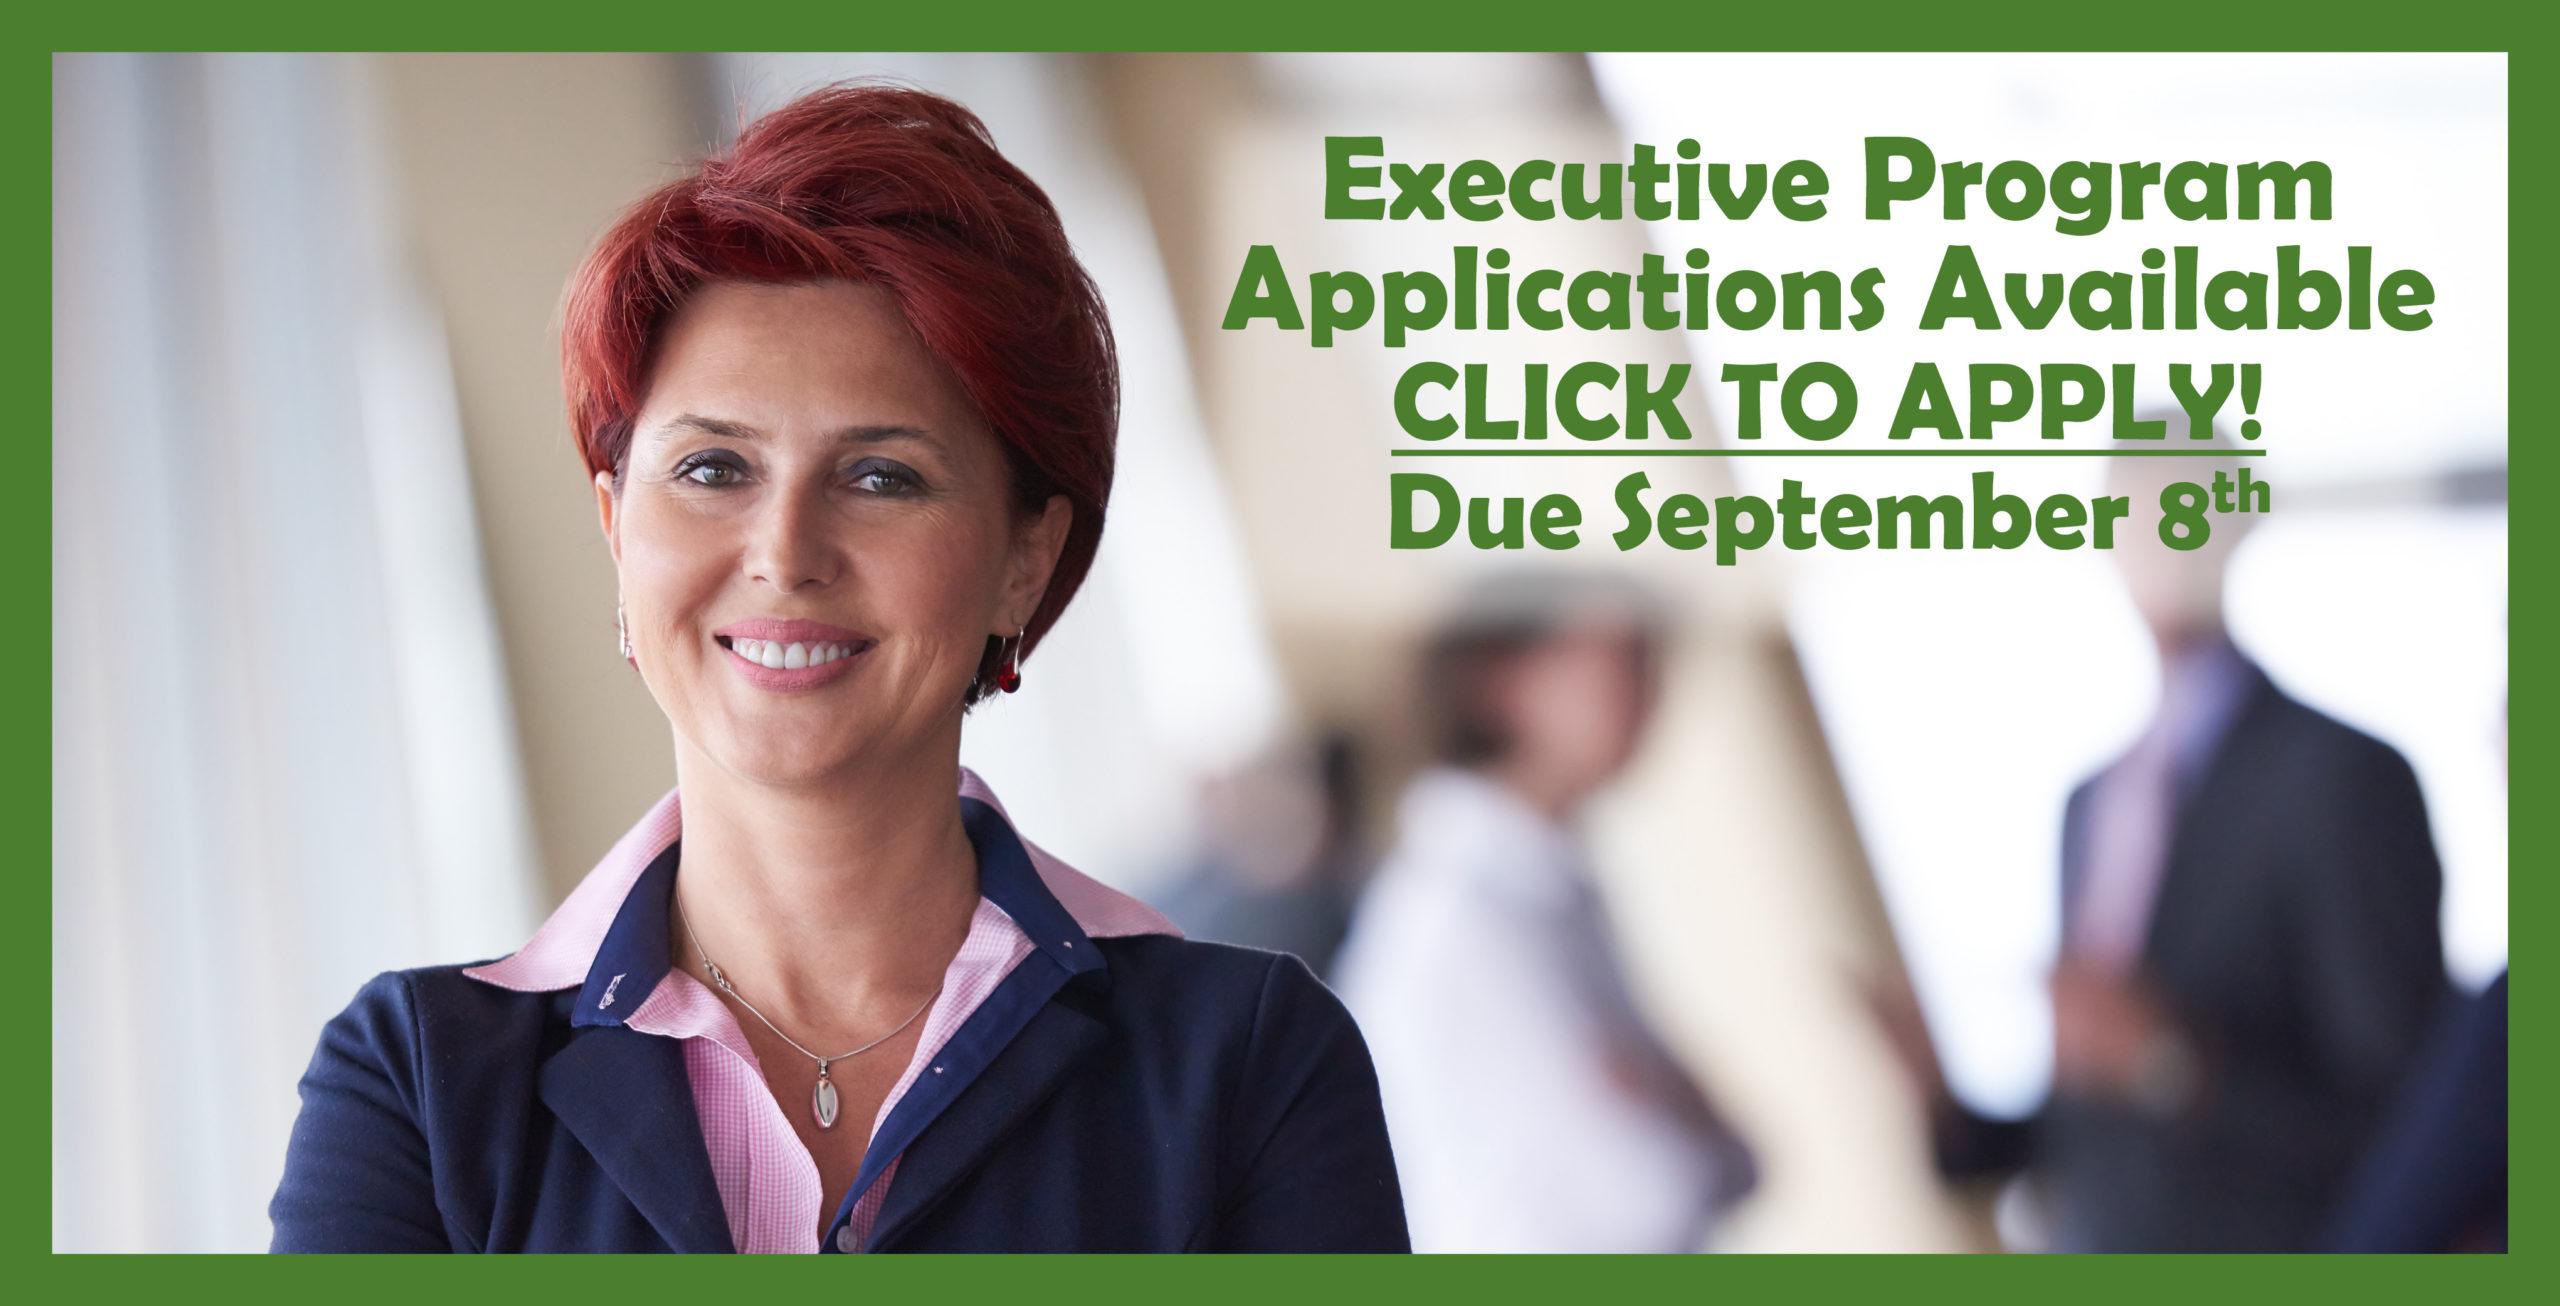 Leadership Lackawanna Applications Open for Executive Program